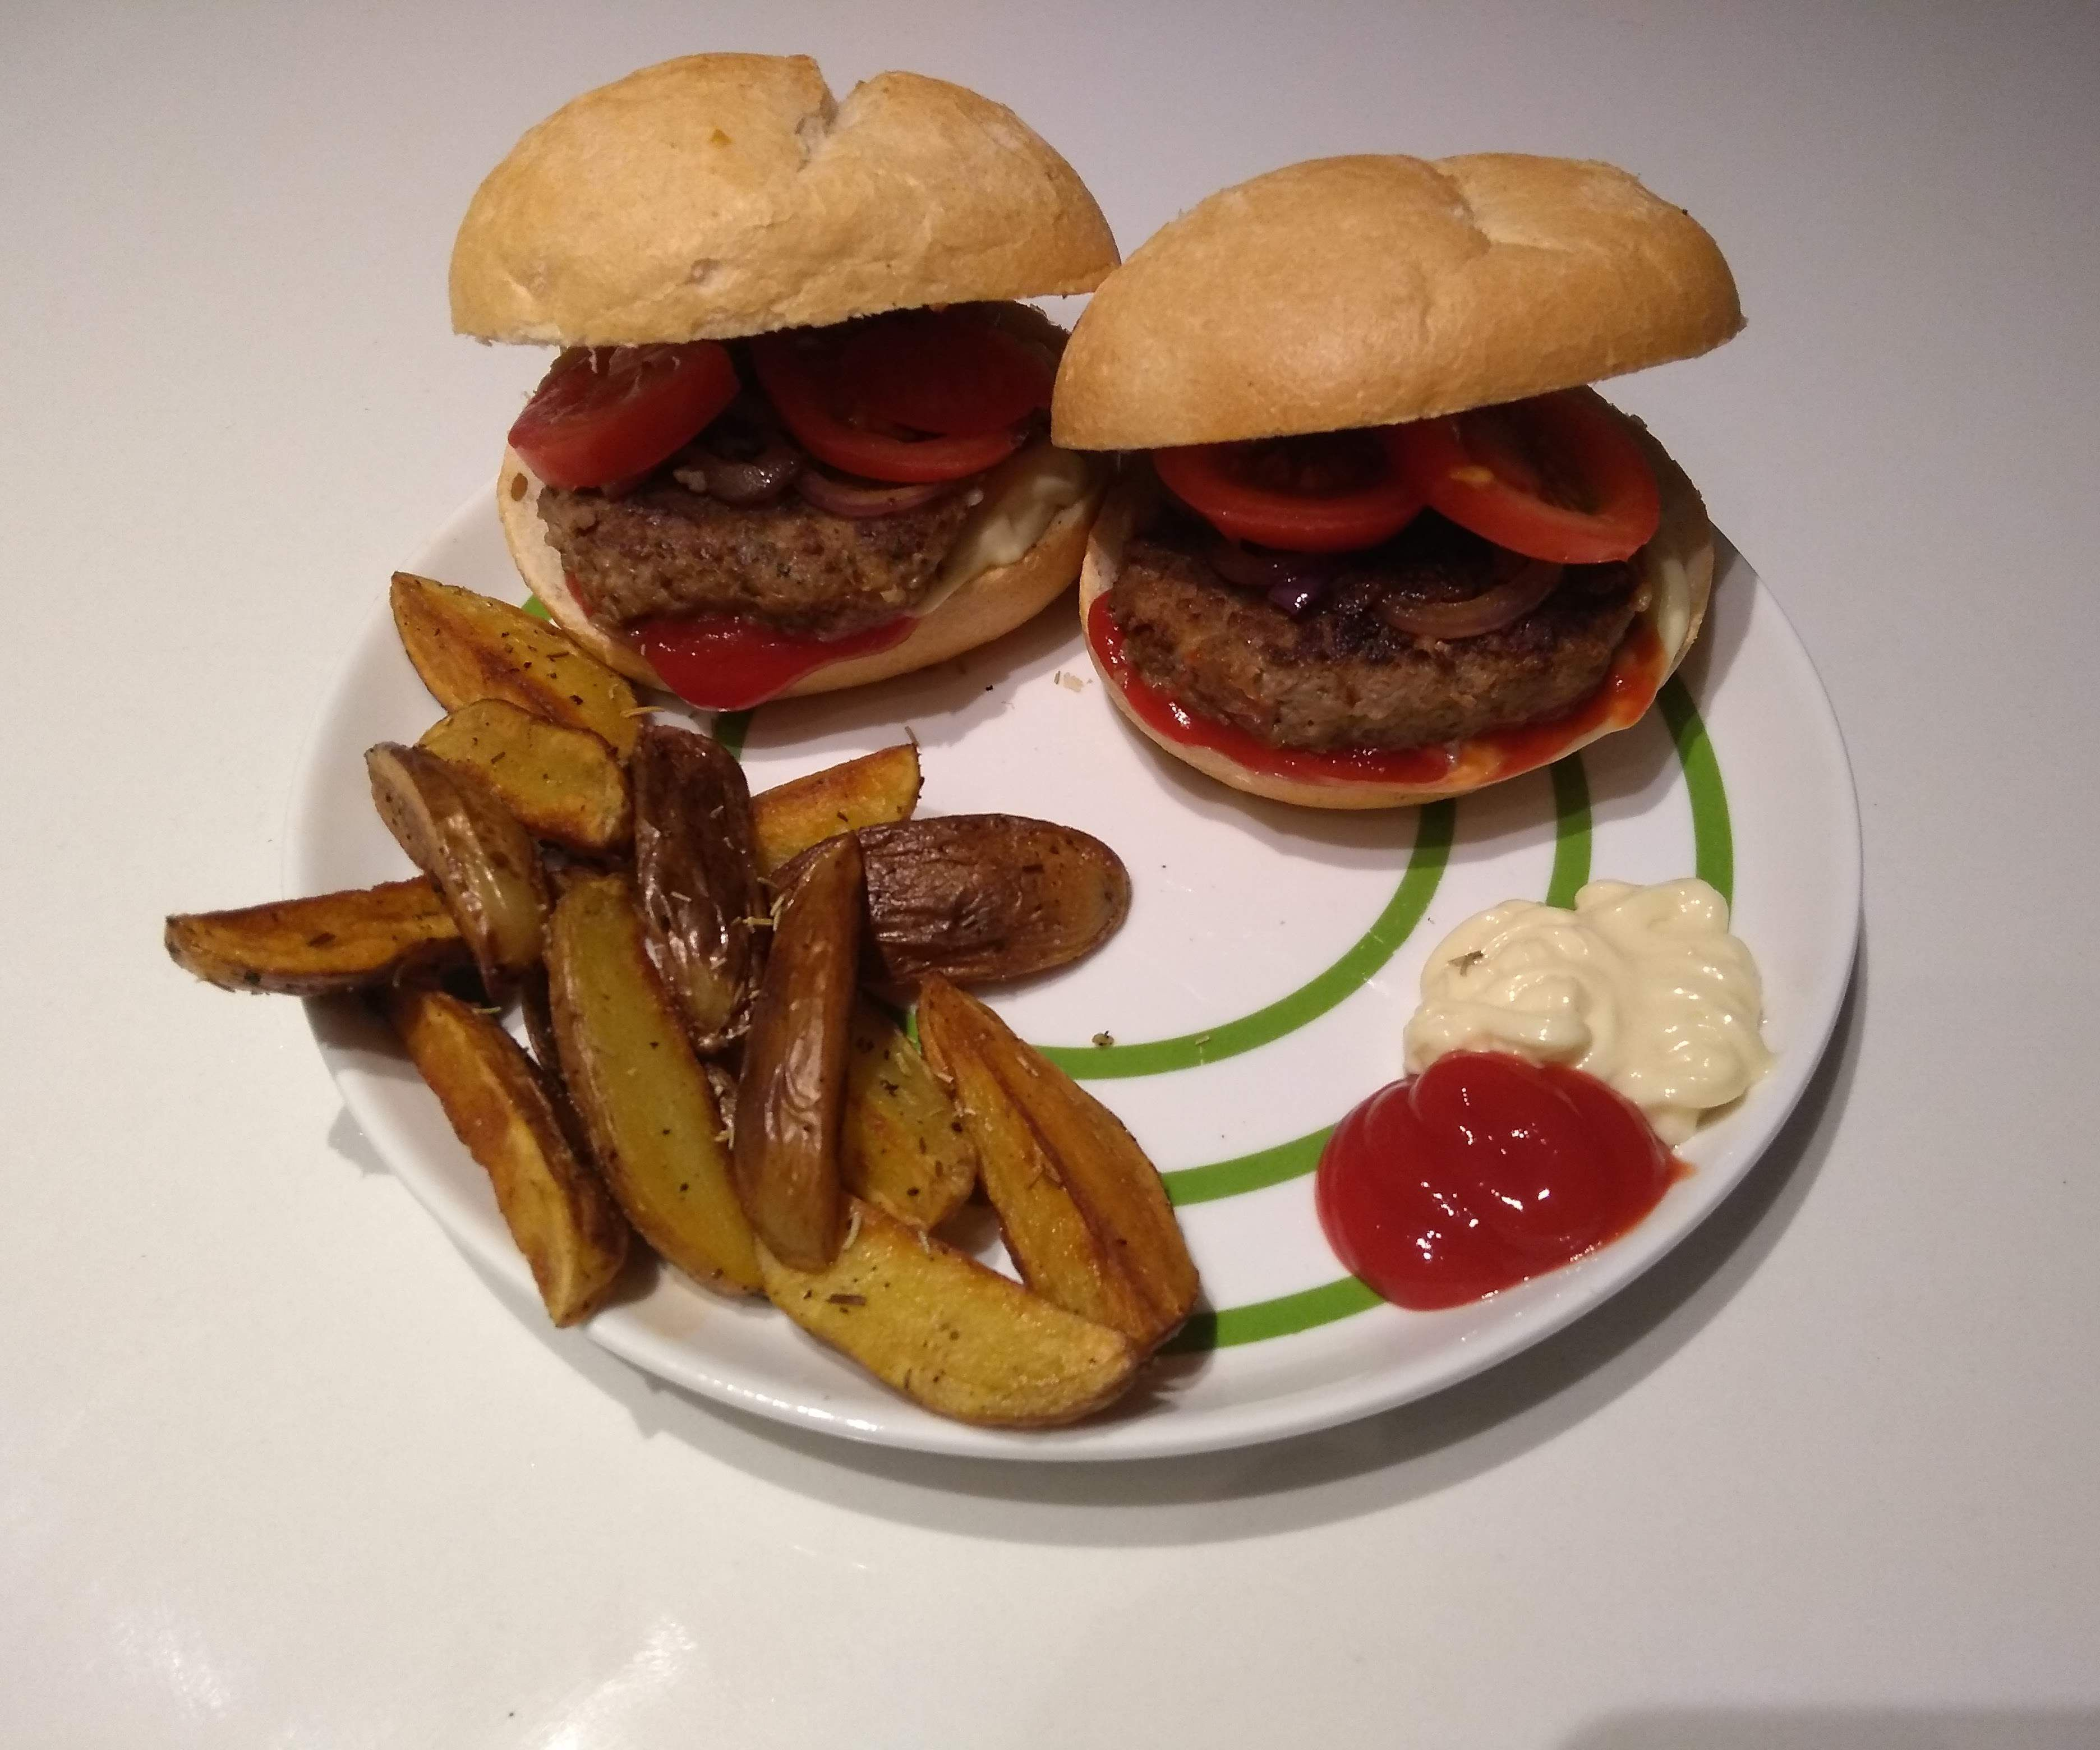 Huisgemaakte Hamburger Met Knapperige Krielkwartjes